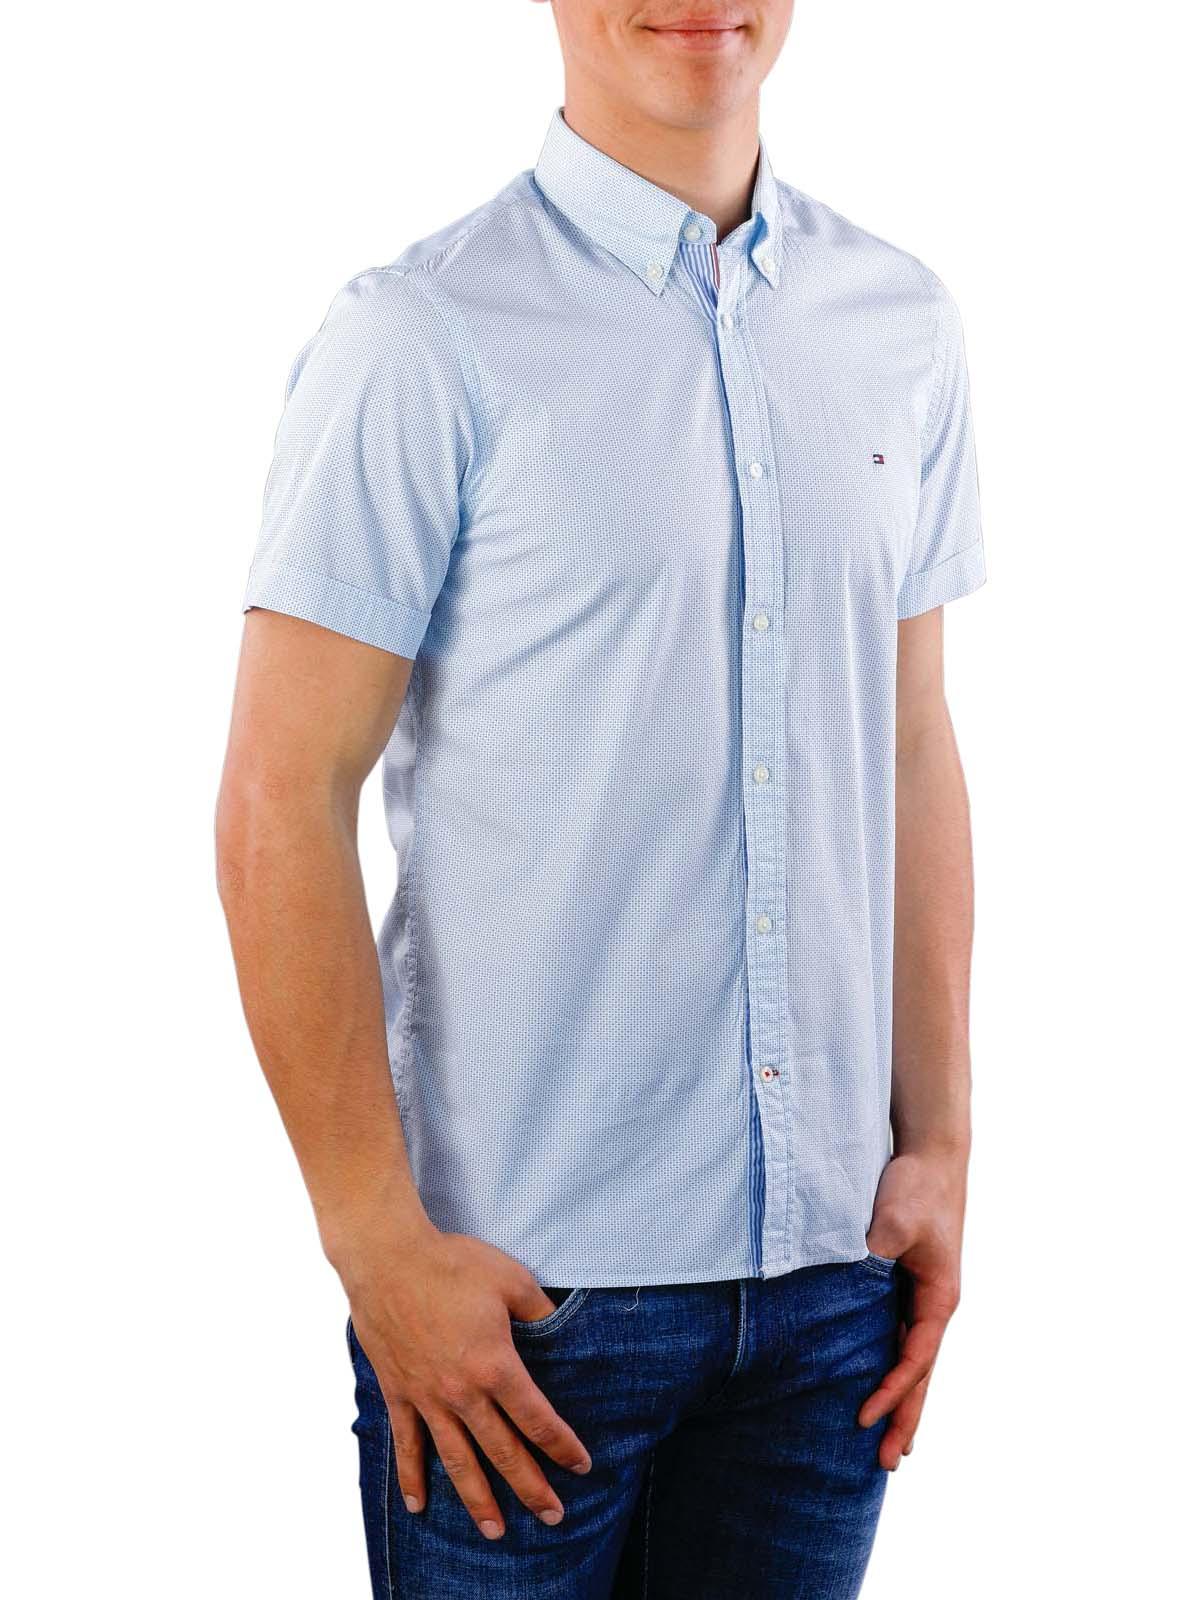 29fa8f375 Fast Delivery | Tommy Hilfiger Slim Mini Print Shirt ... - McJeans.ch